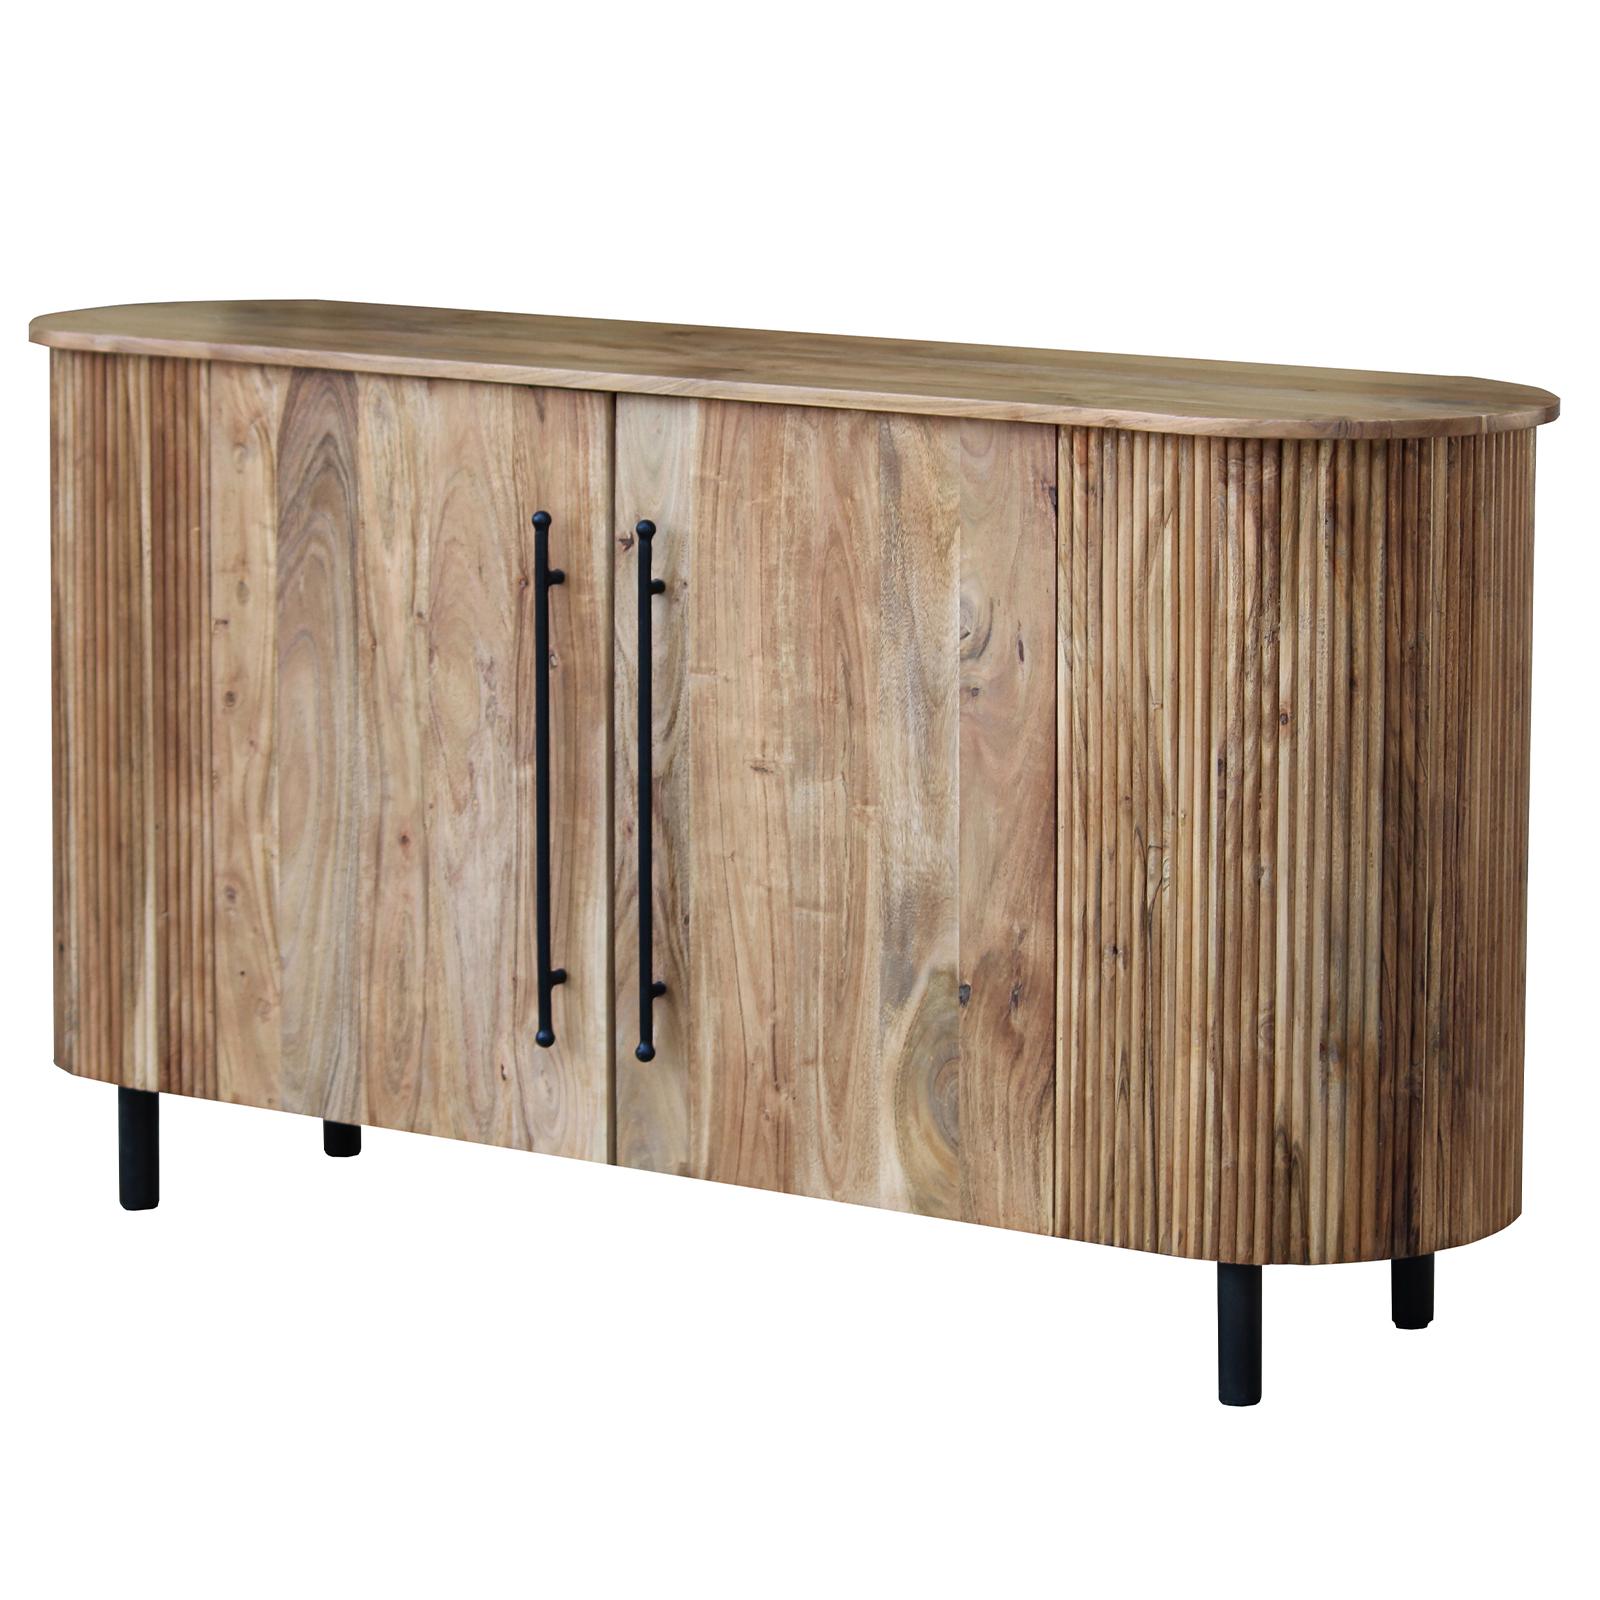 Sideboard Runda aus Akazie Massivholz - 160 cm